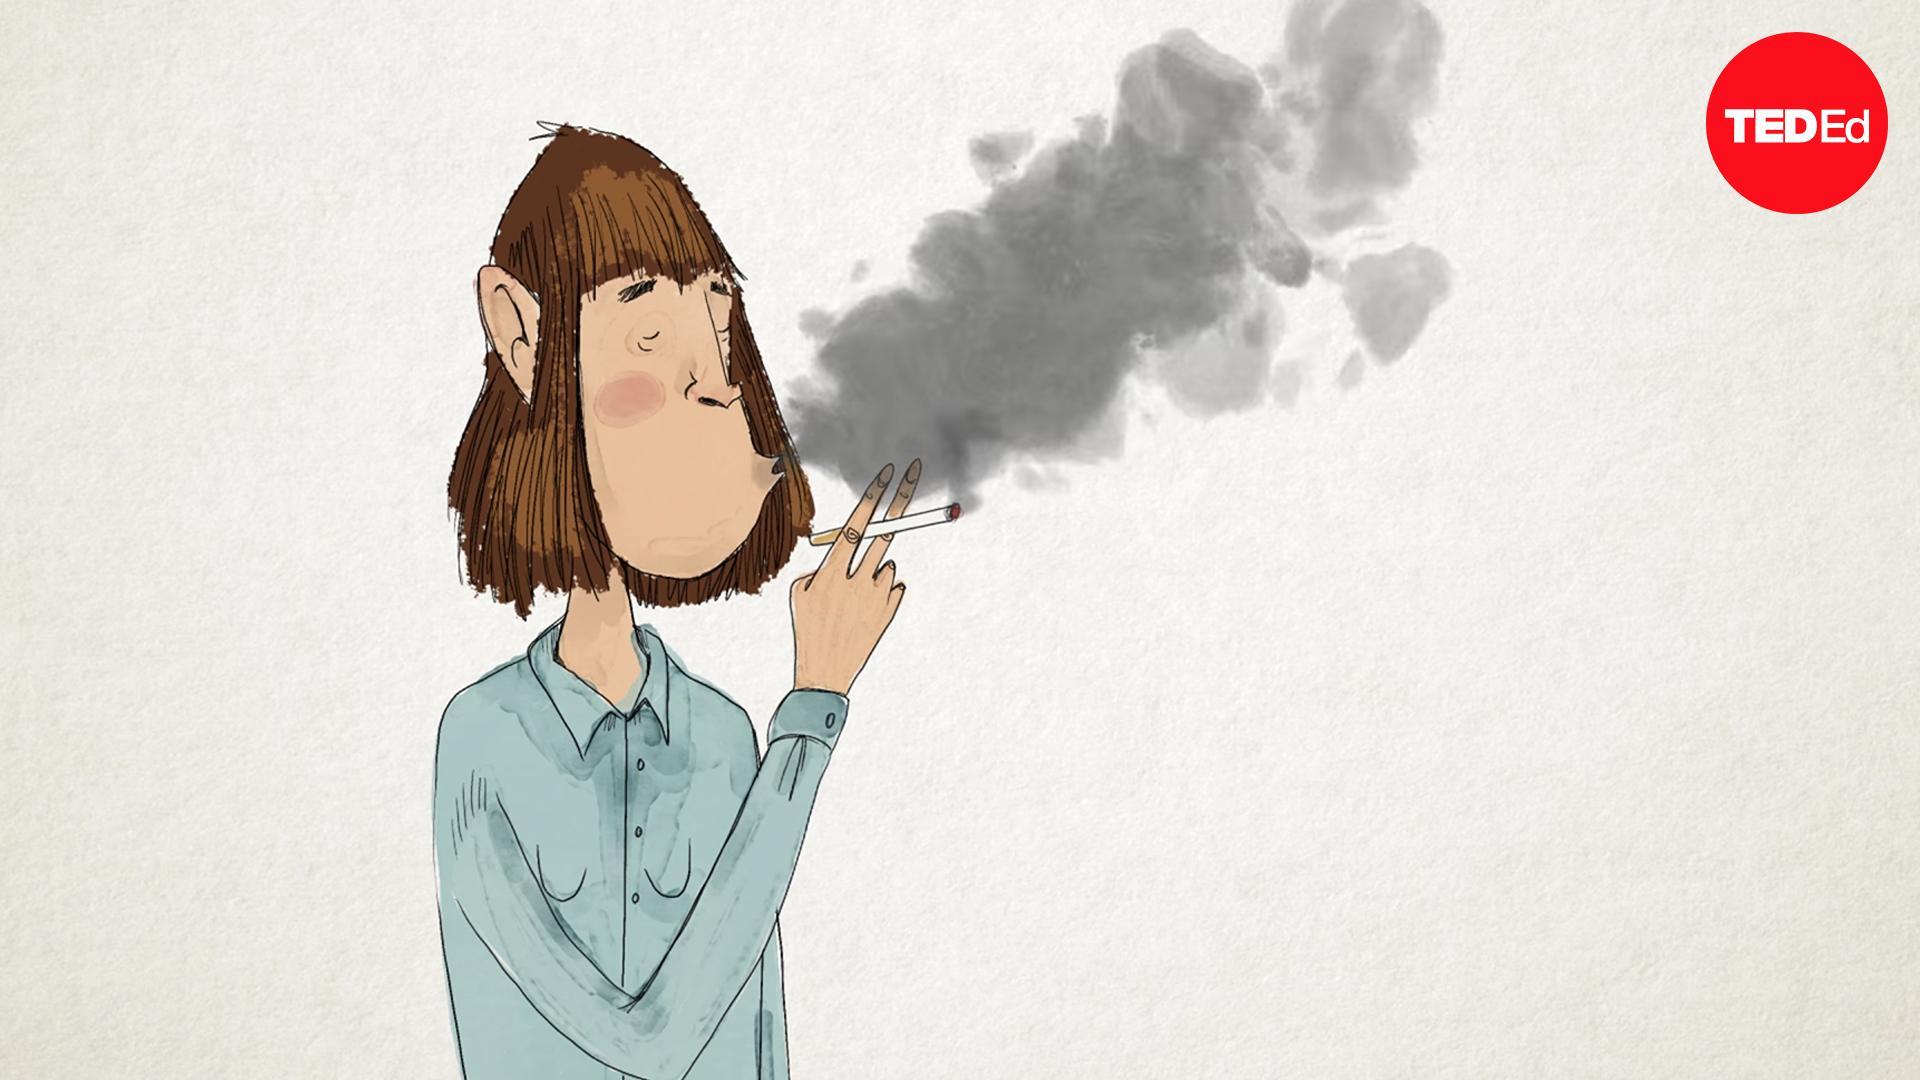 Cigarette textless